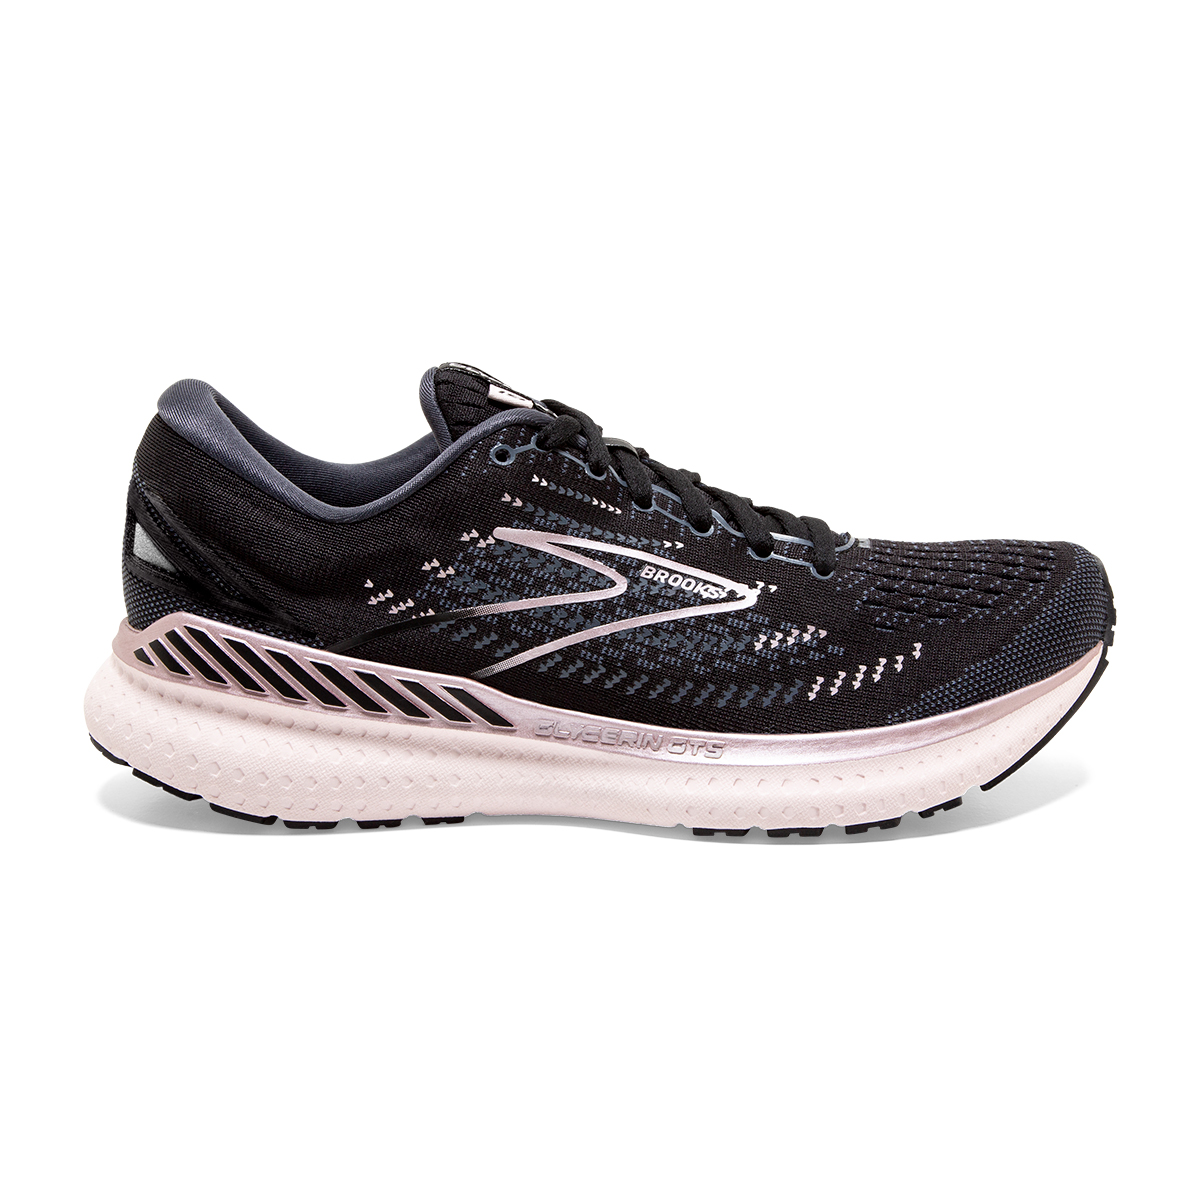 Women's Brooks Glycerin GTS 19 Running Shoe - Color: Black/Ombre/Metallic - Size: 7.5 - Width: Regular, Black/Ombre/Metallic, large, image 1